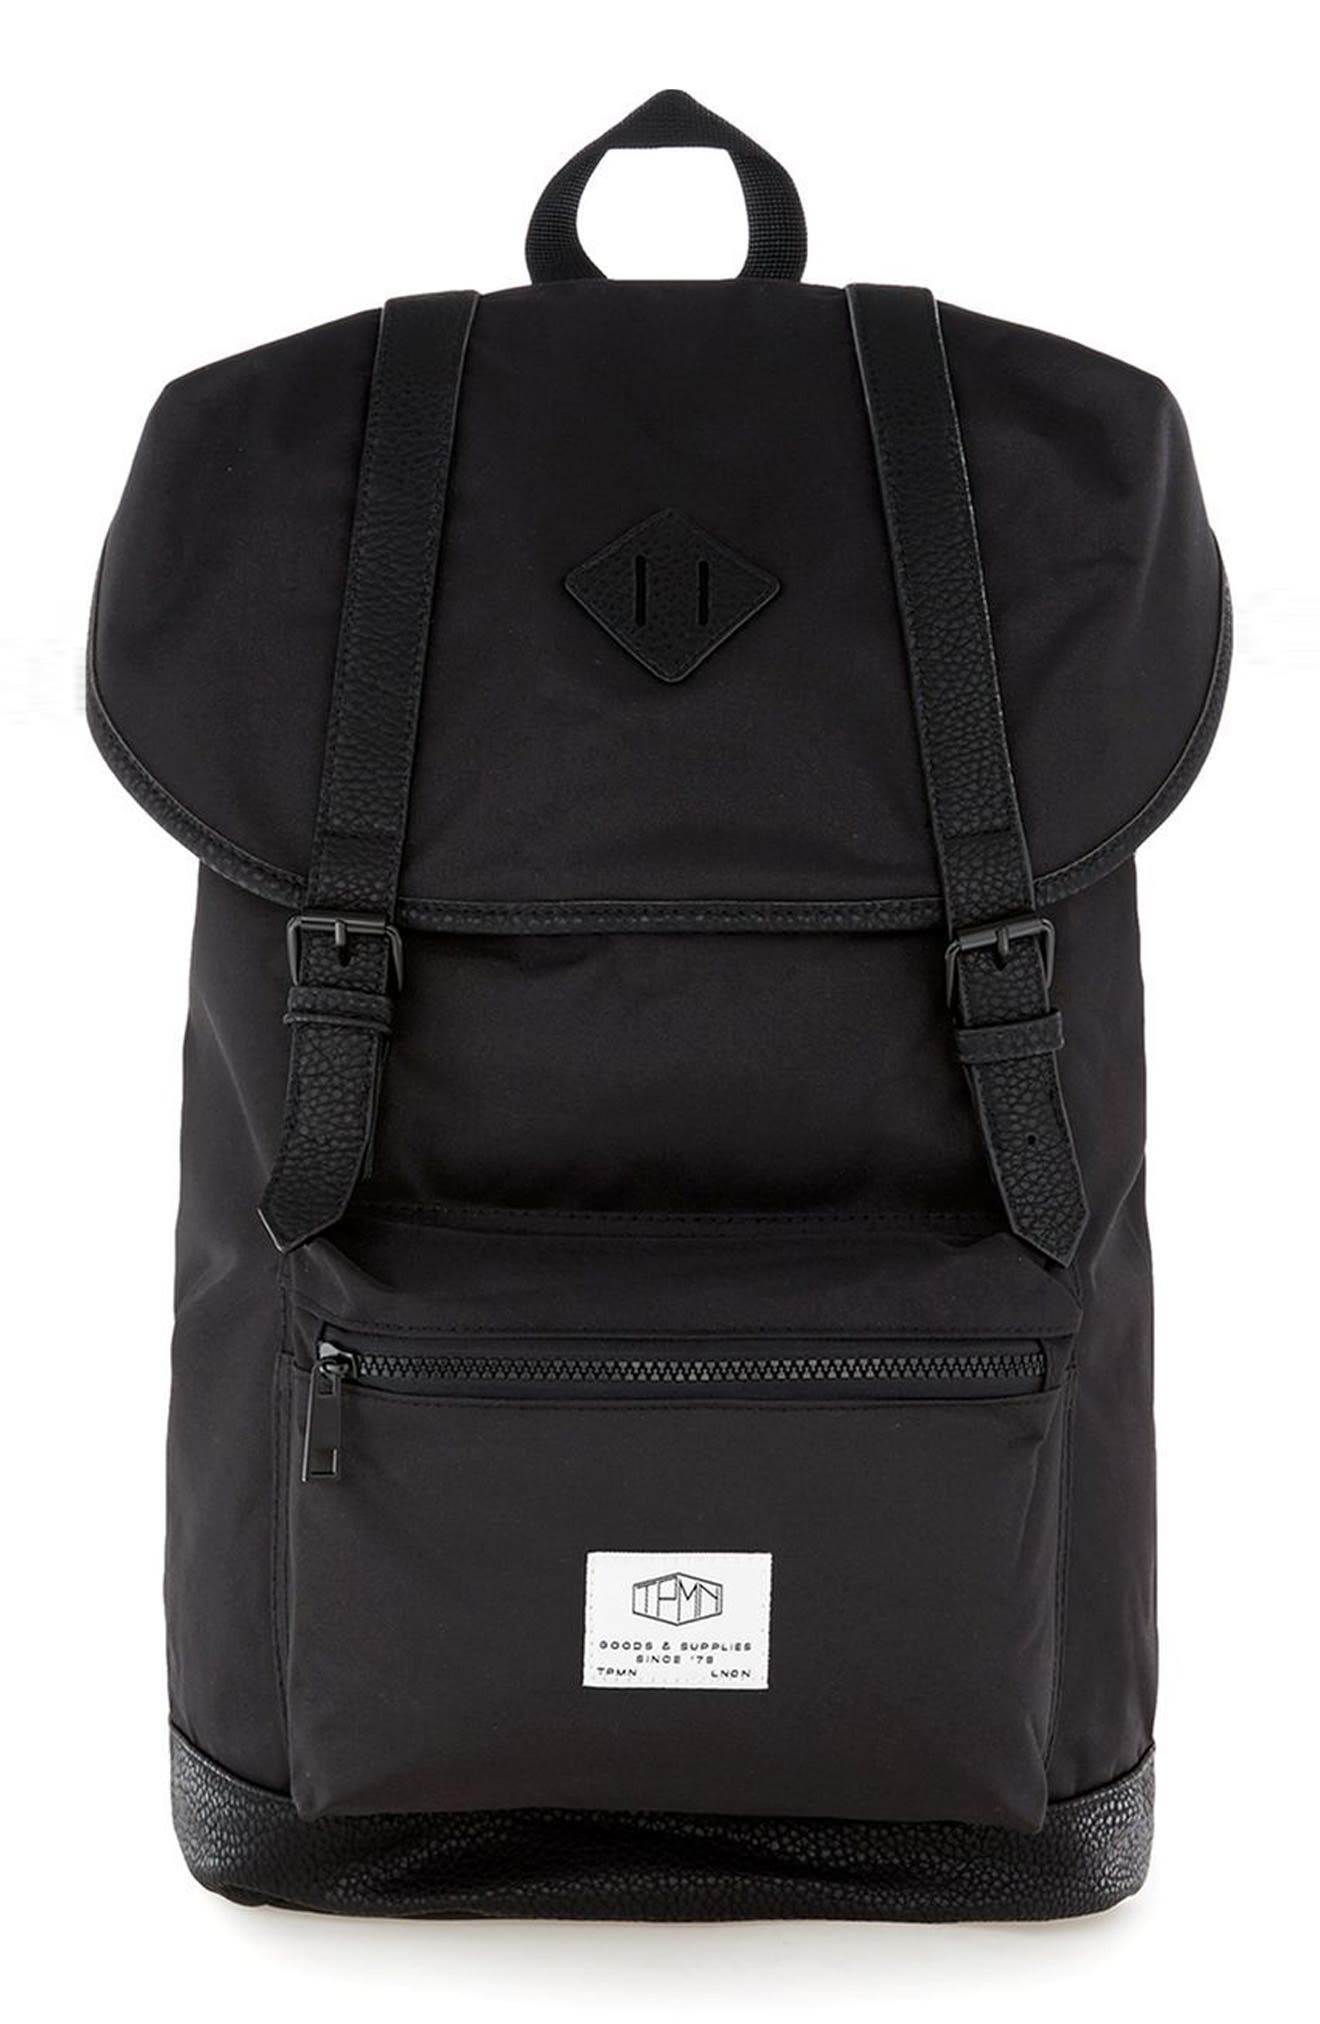 Explorer Backpack,                             Main thumbnail 1, color,                             Black